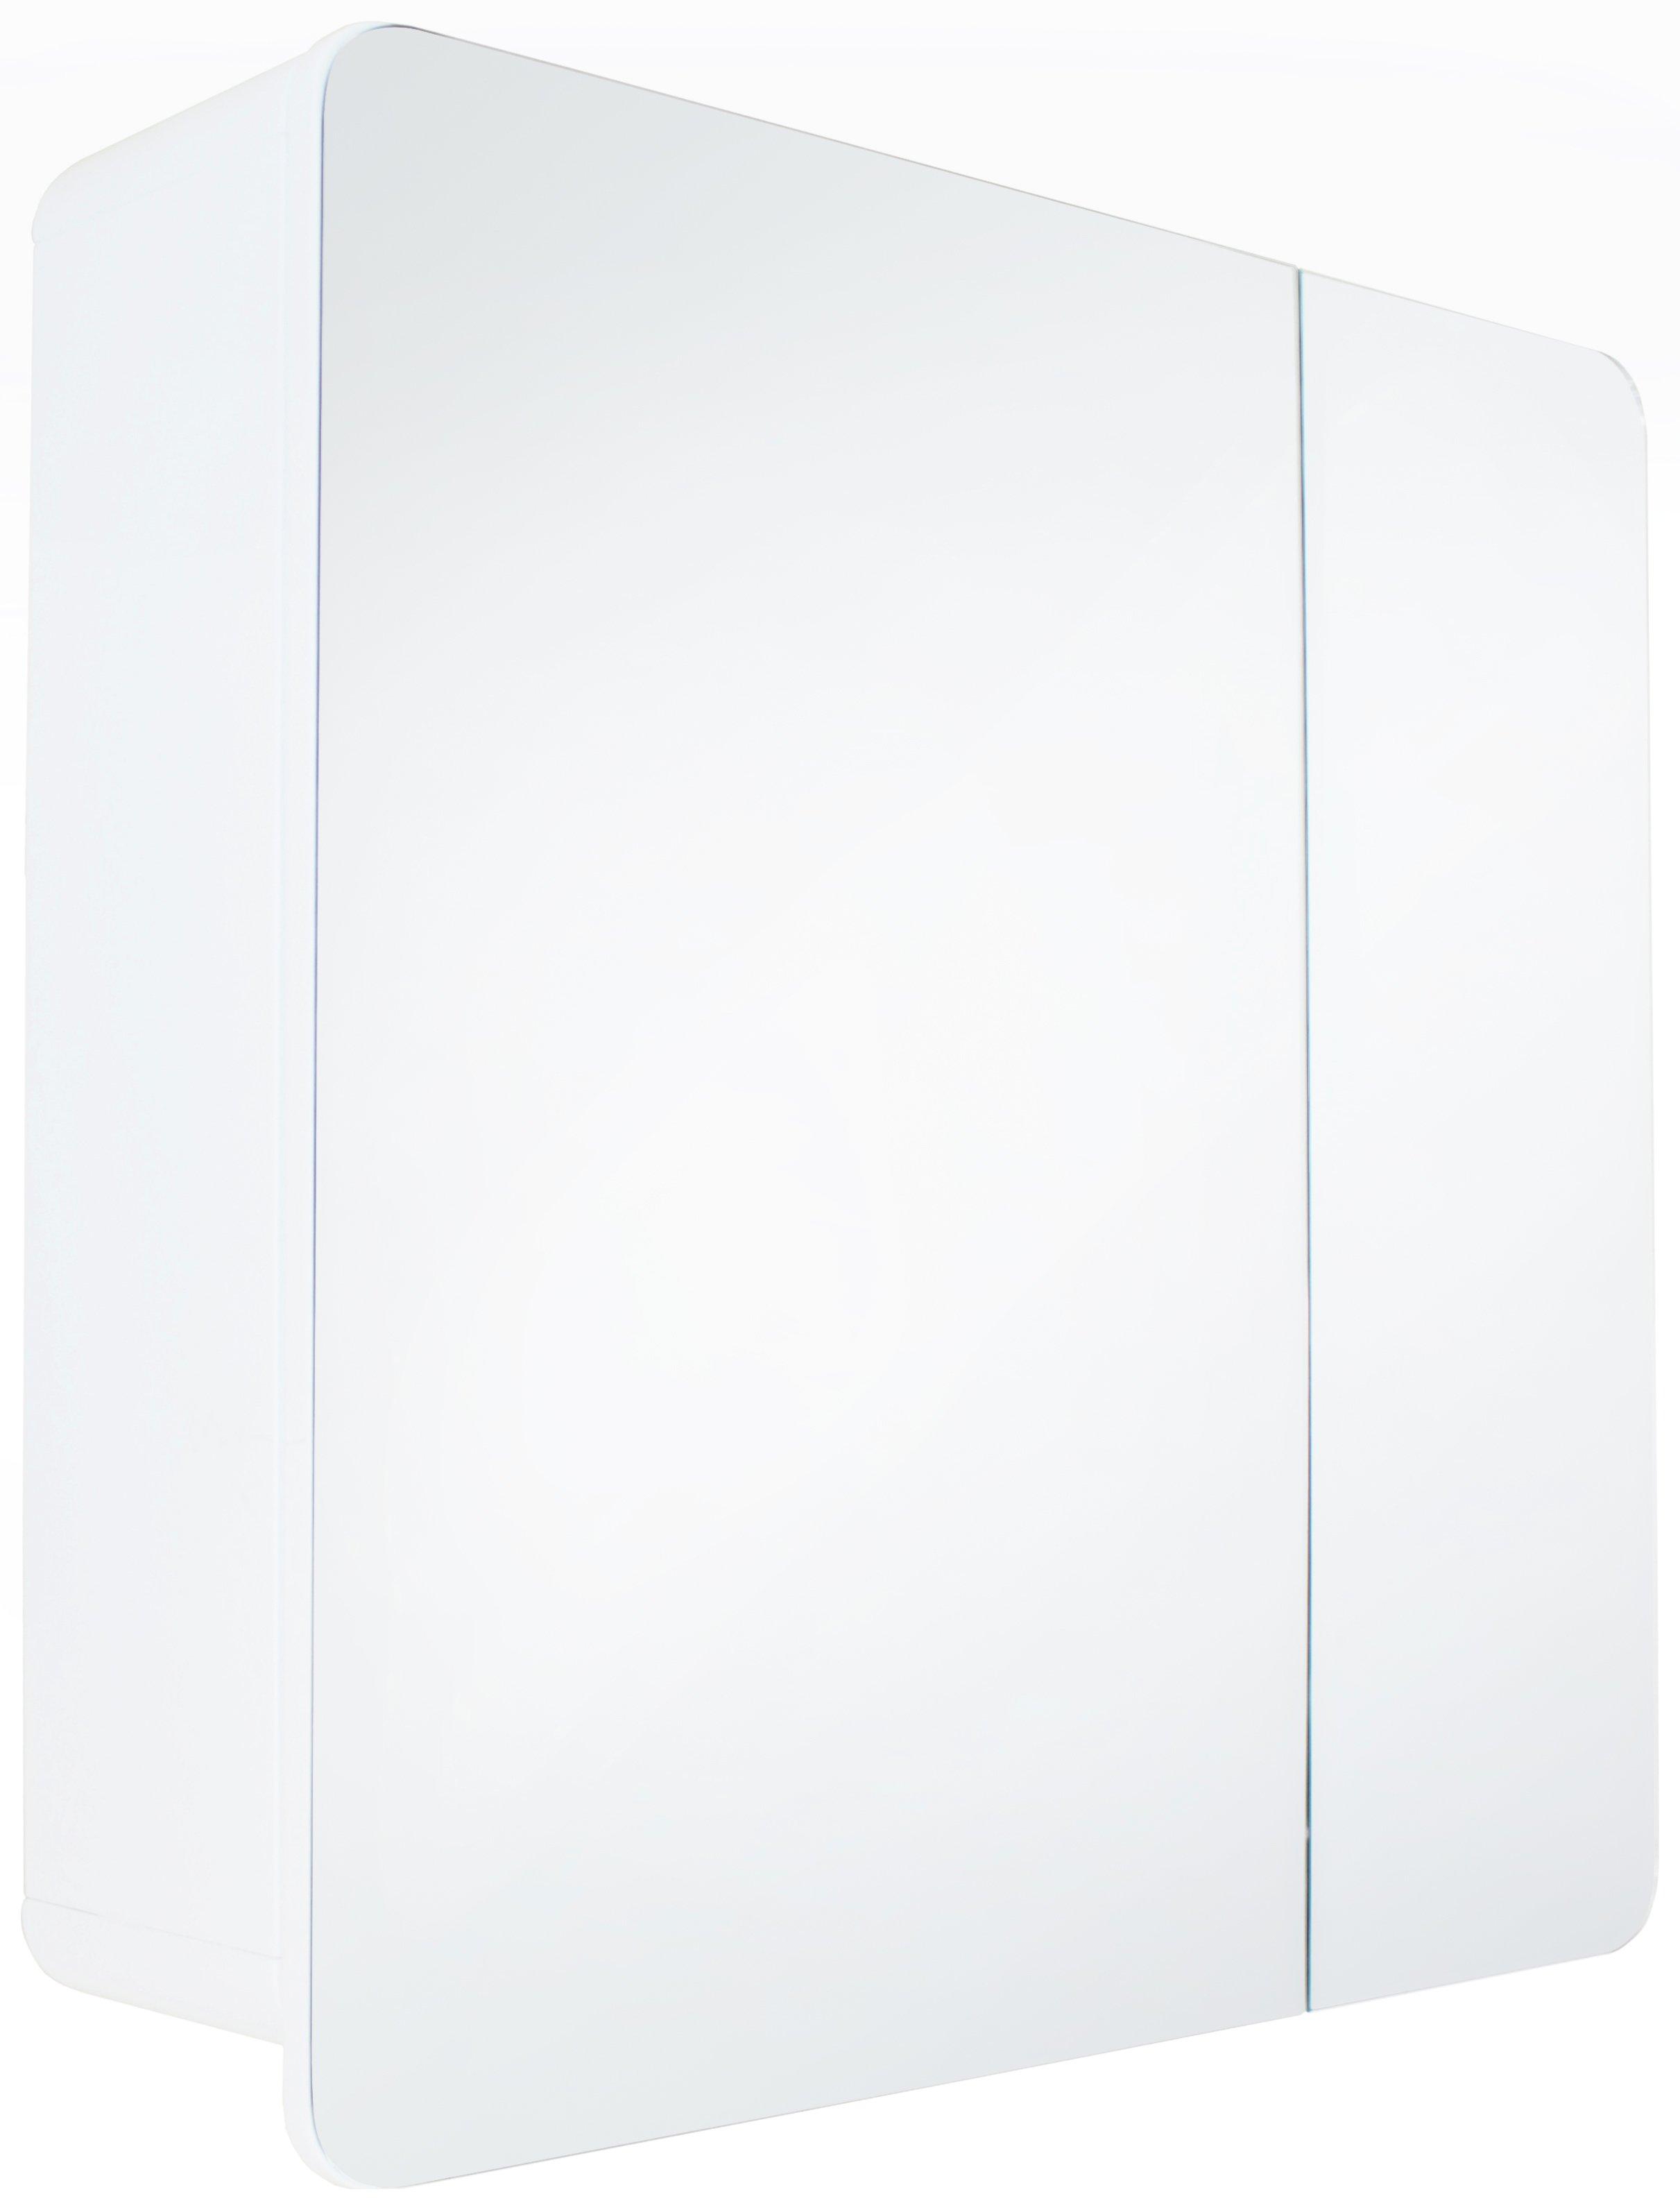 Buy Argos Home Curve 2 Door Mirrored Bathroom Cabinet White